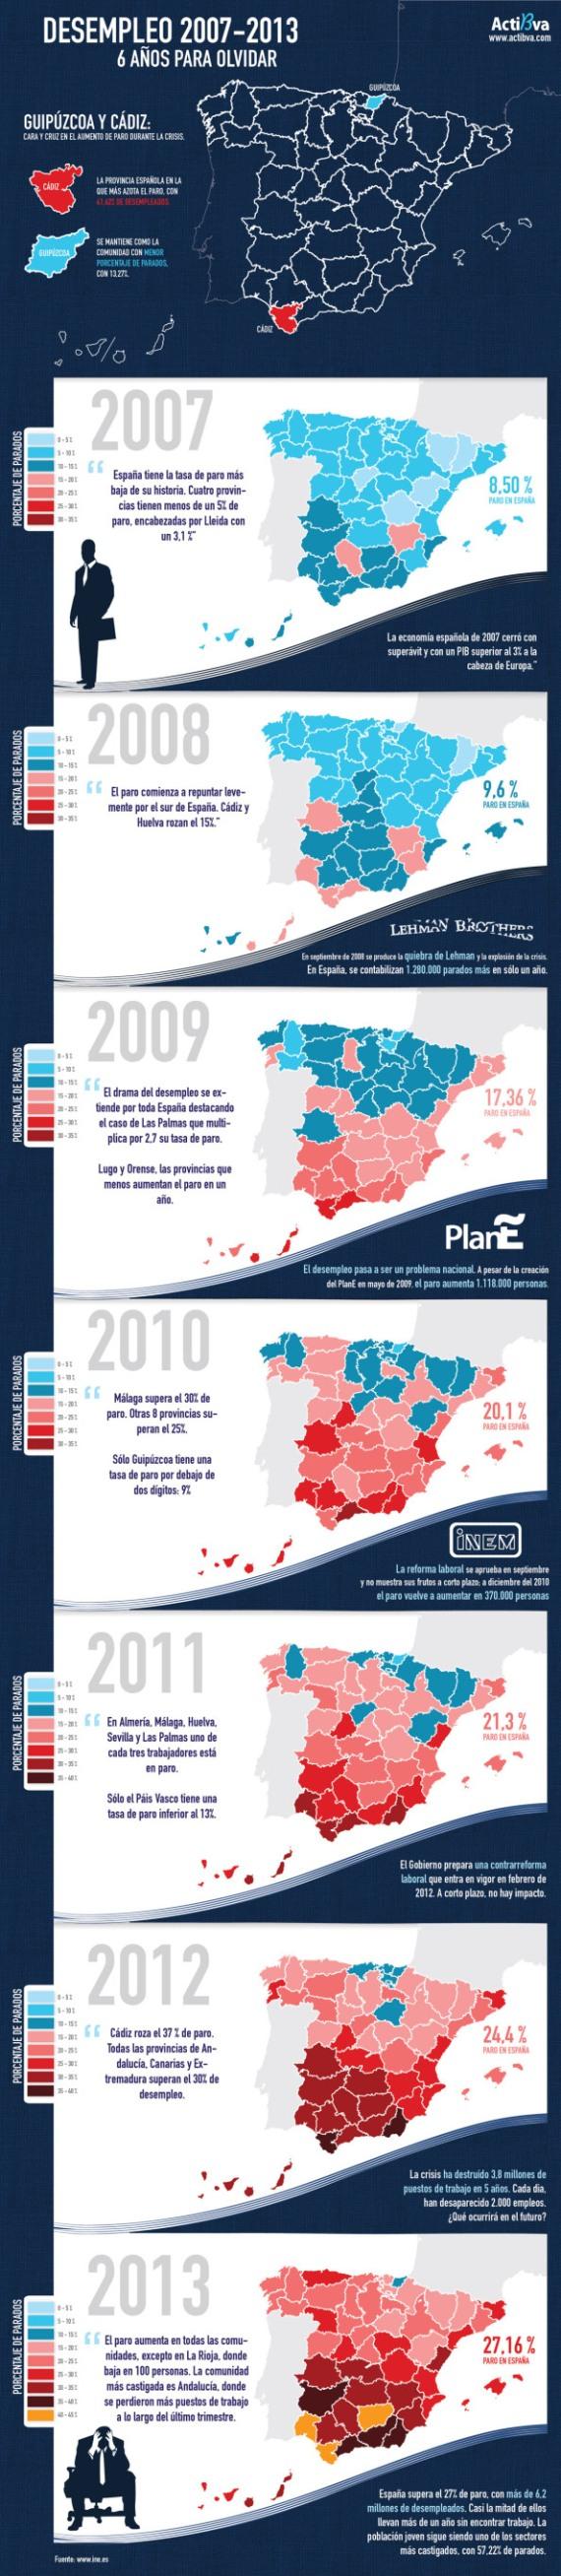 espana-2013-1